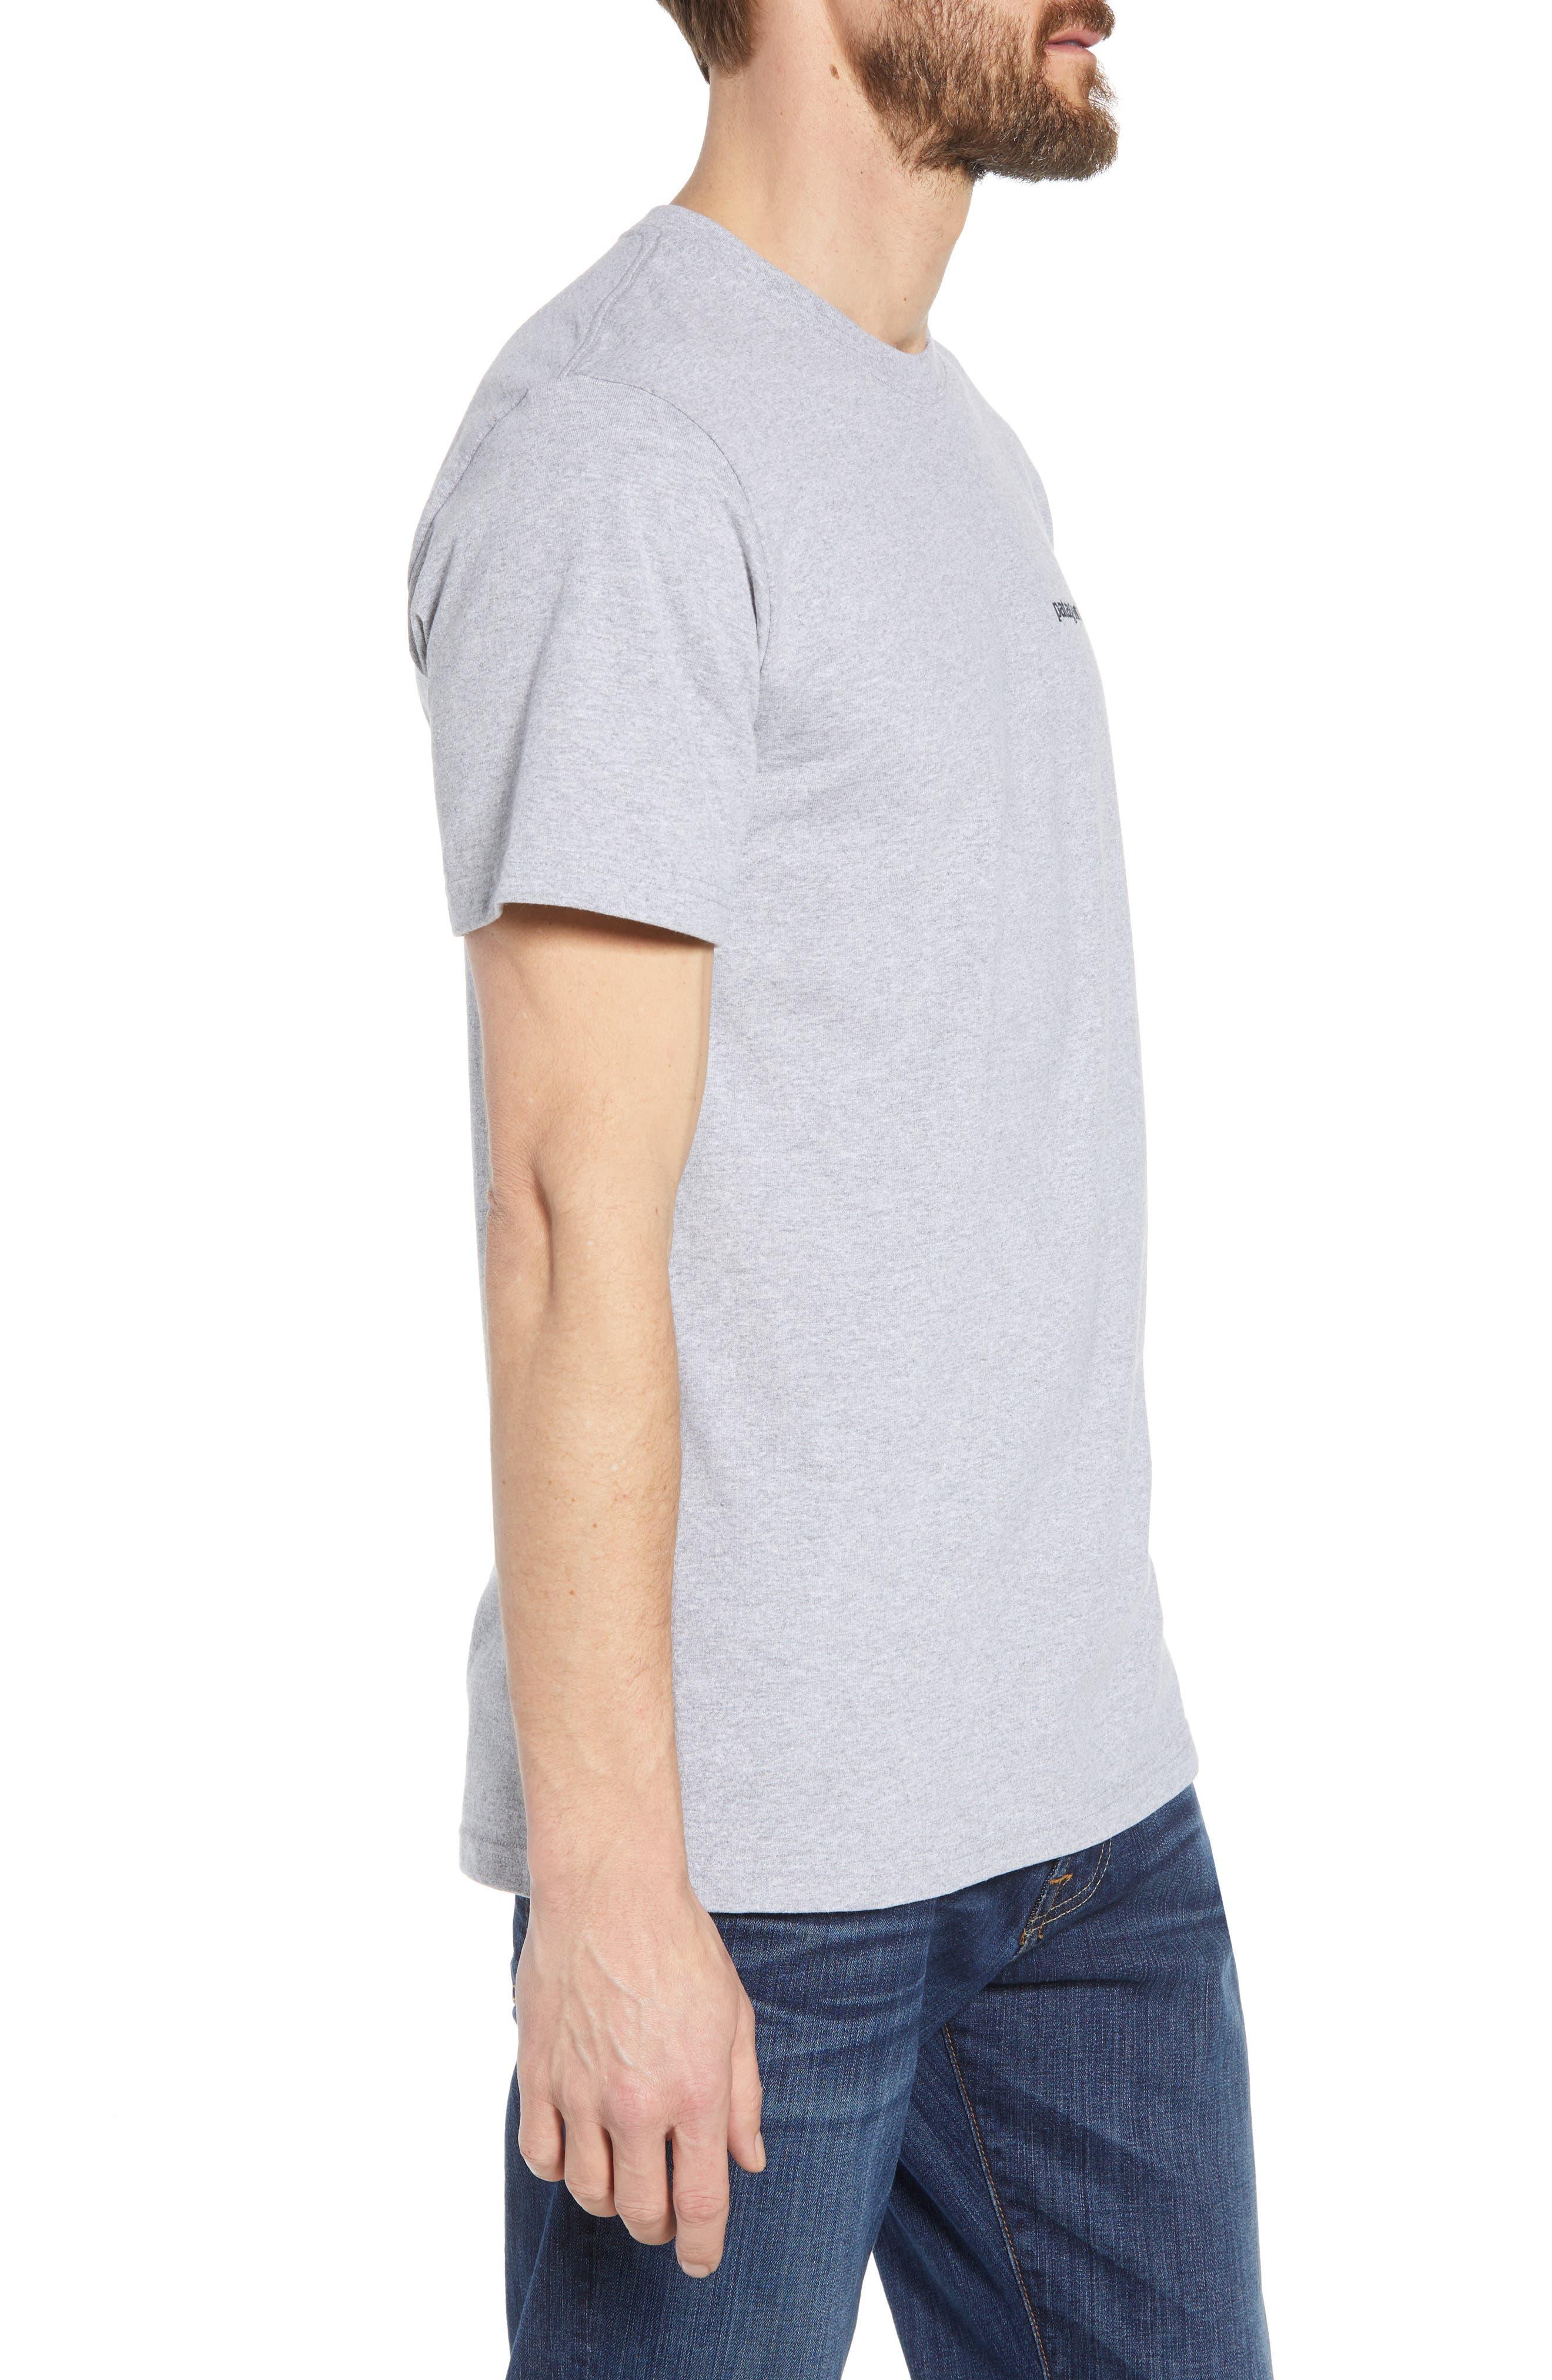 Fitz Roy Trout Crewneck T-Shirt,                             Alternate thumbnail 3, color,                             DRIFTER GREY